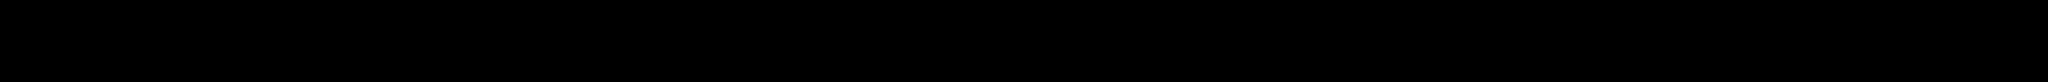 MEYLE MEM0036, 0005811V007, 0005811V007000000, 058 11 V005 000, 05811V006000 Έδραση, κινητήρας